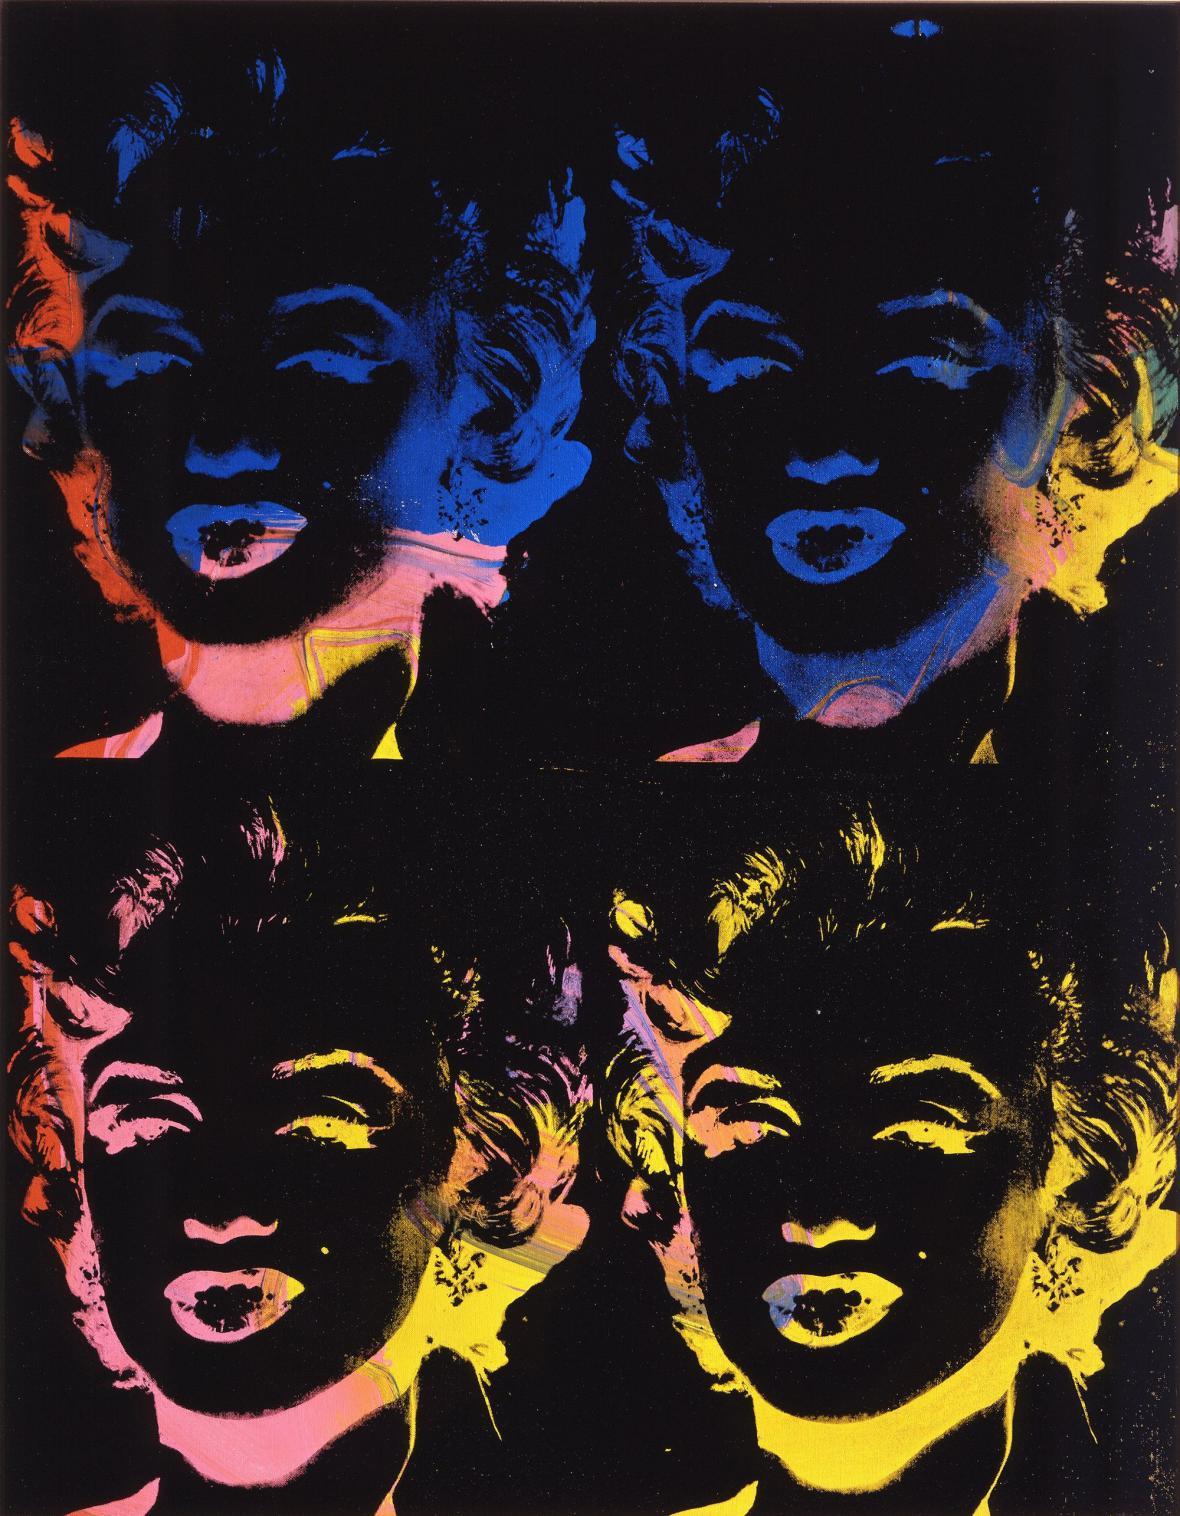 Andy Warhol / Čtyři Marilyn, 1979-1986